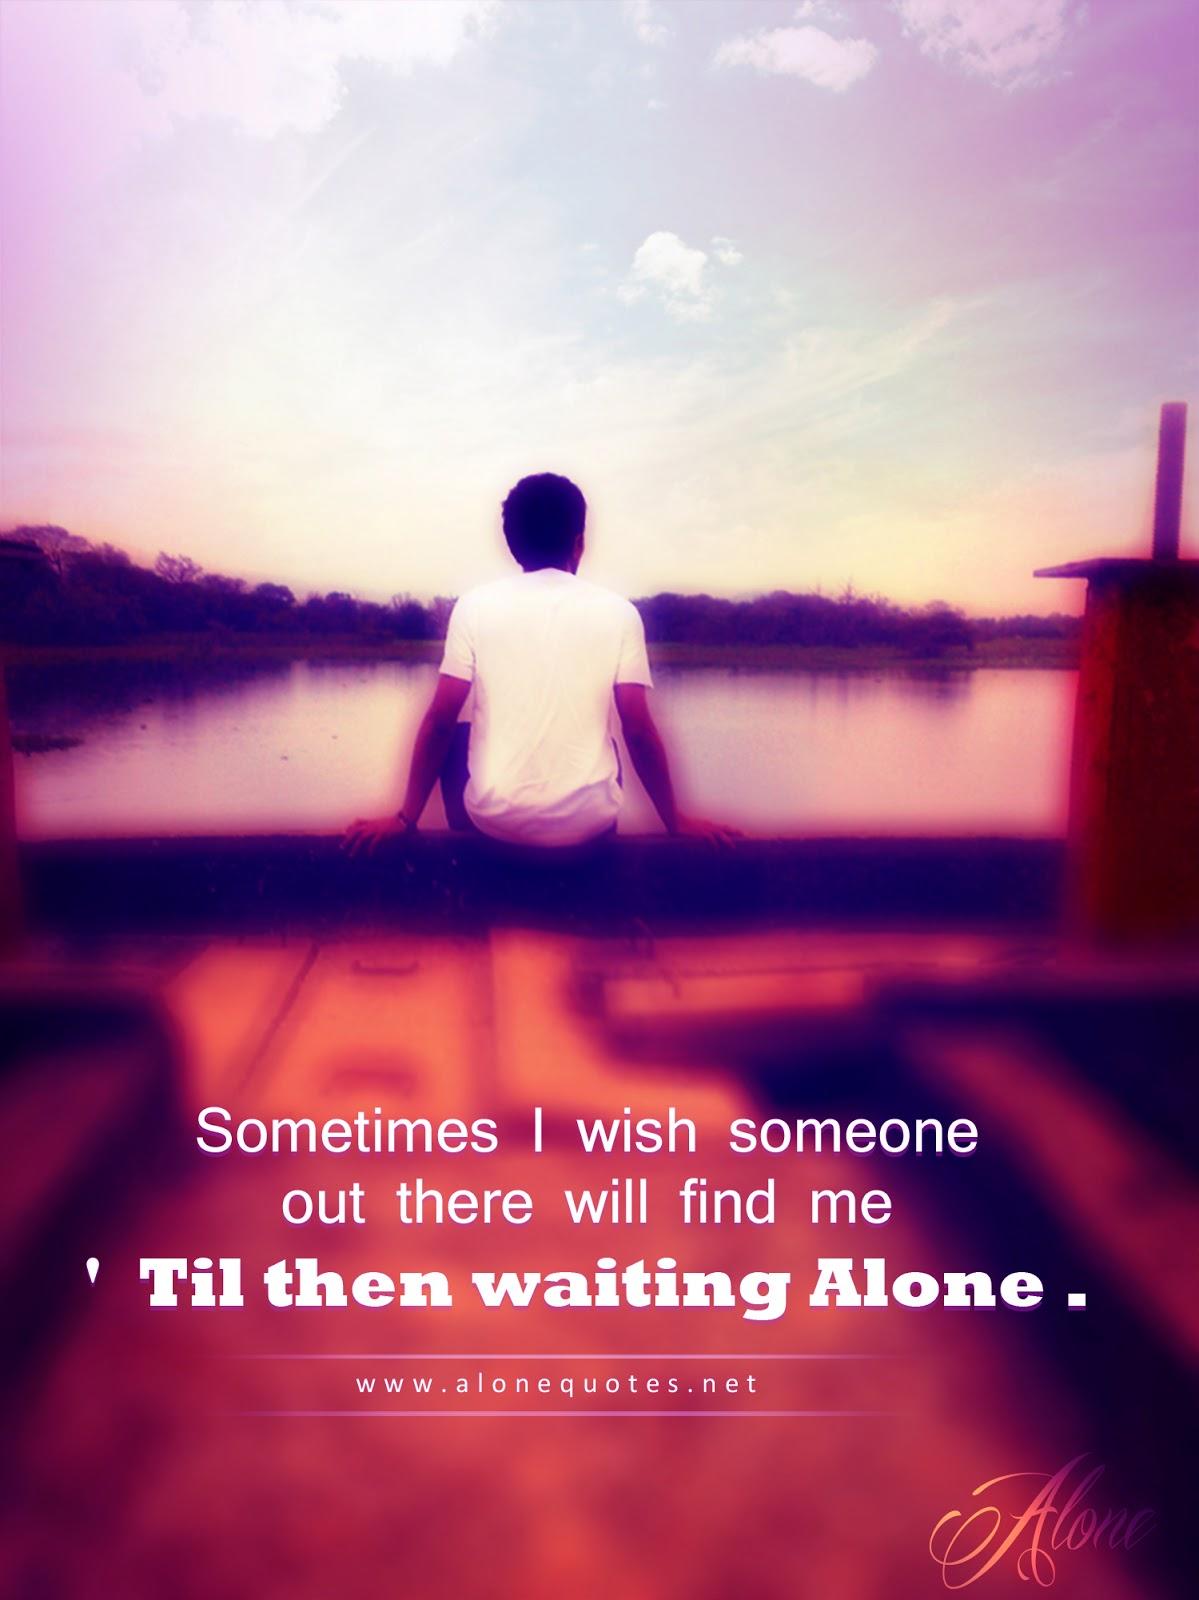 Alone Boy Wallaperps Alone Boy Hd Wallpaper Free Download